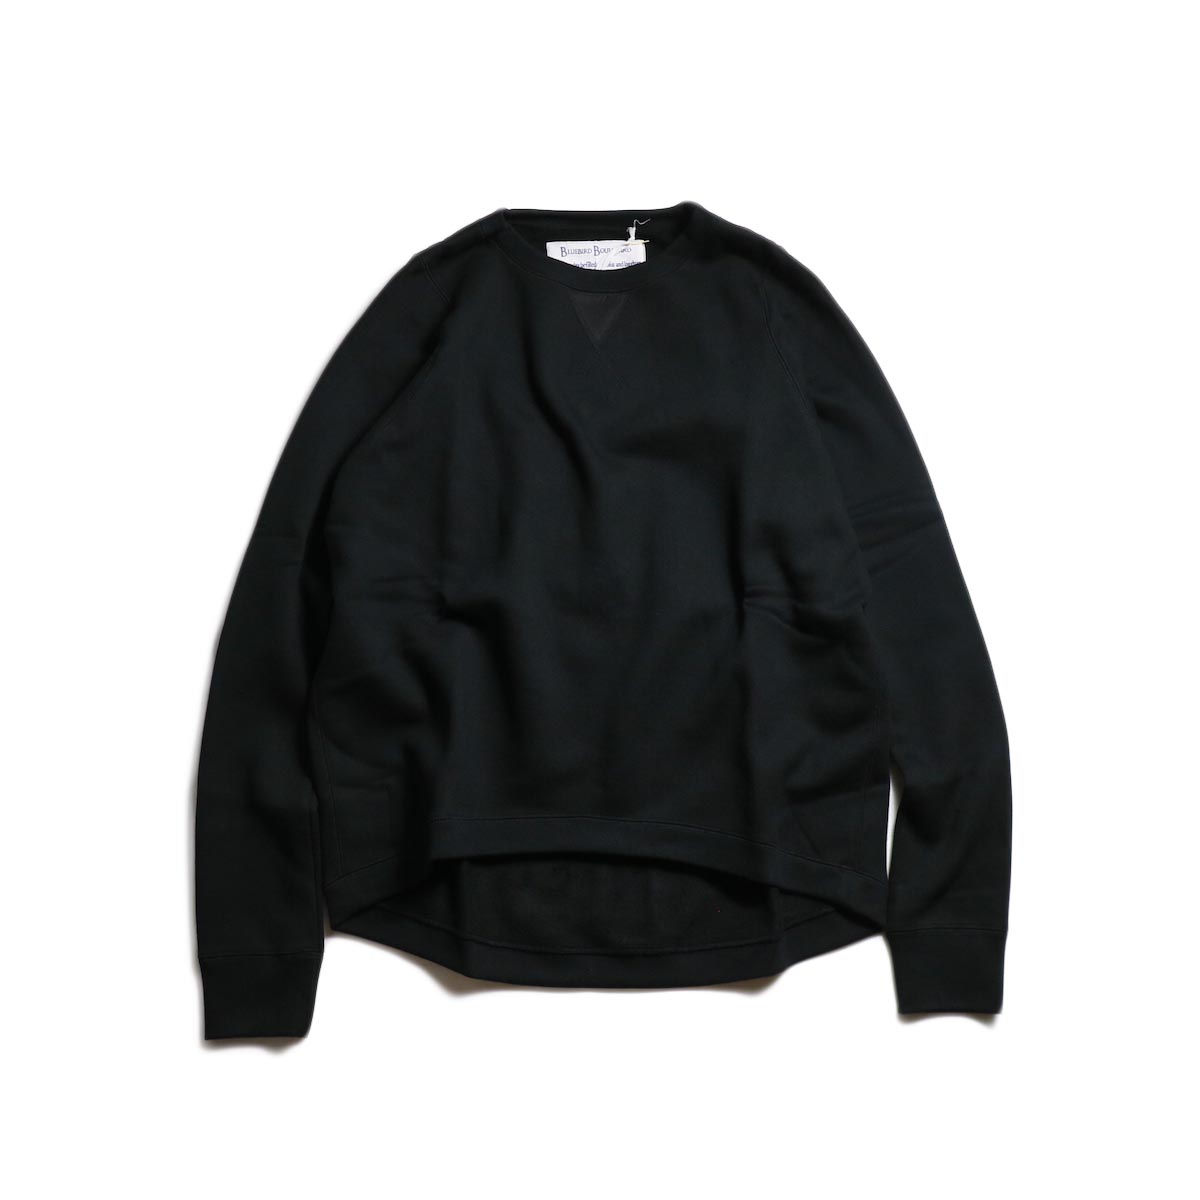 BLUEBIRD BOULEVARD / ビッグシルエットスウェットシャツ (Black)